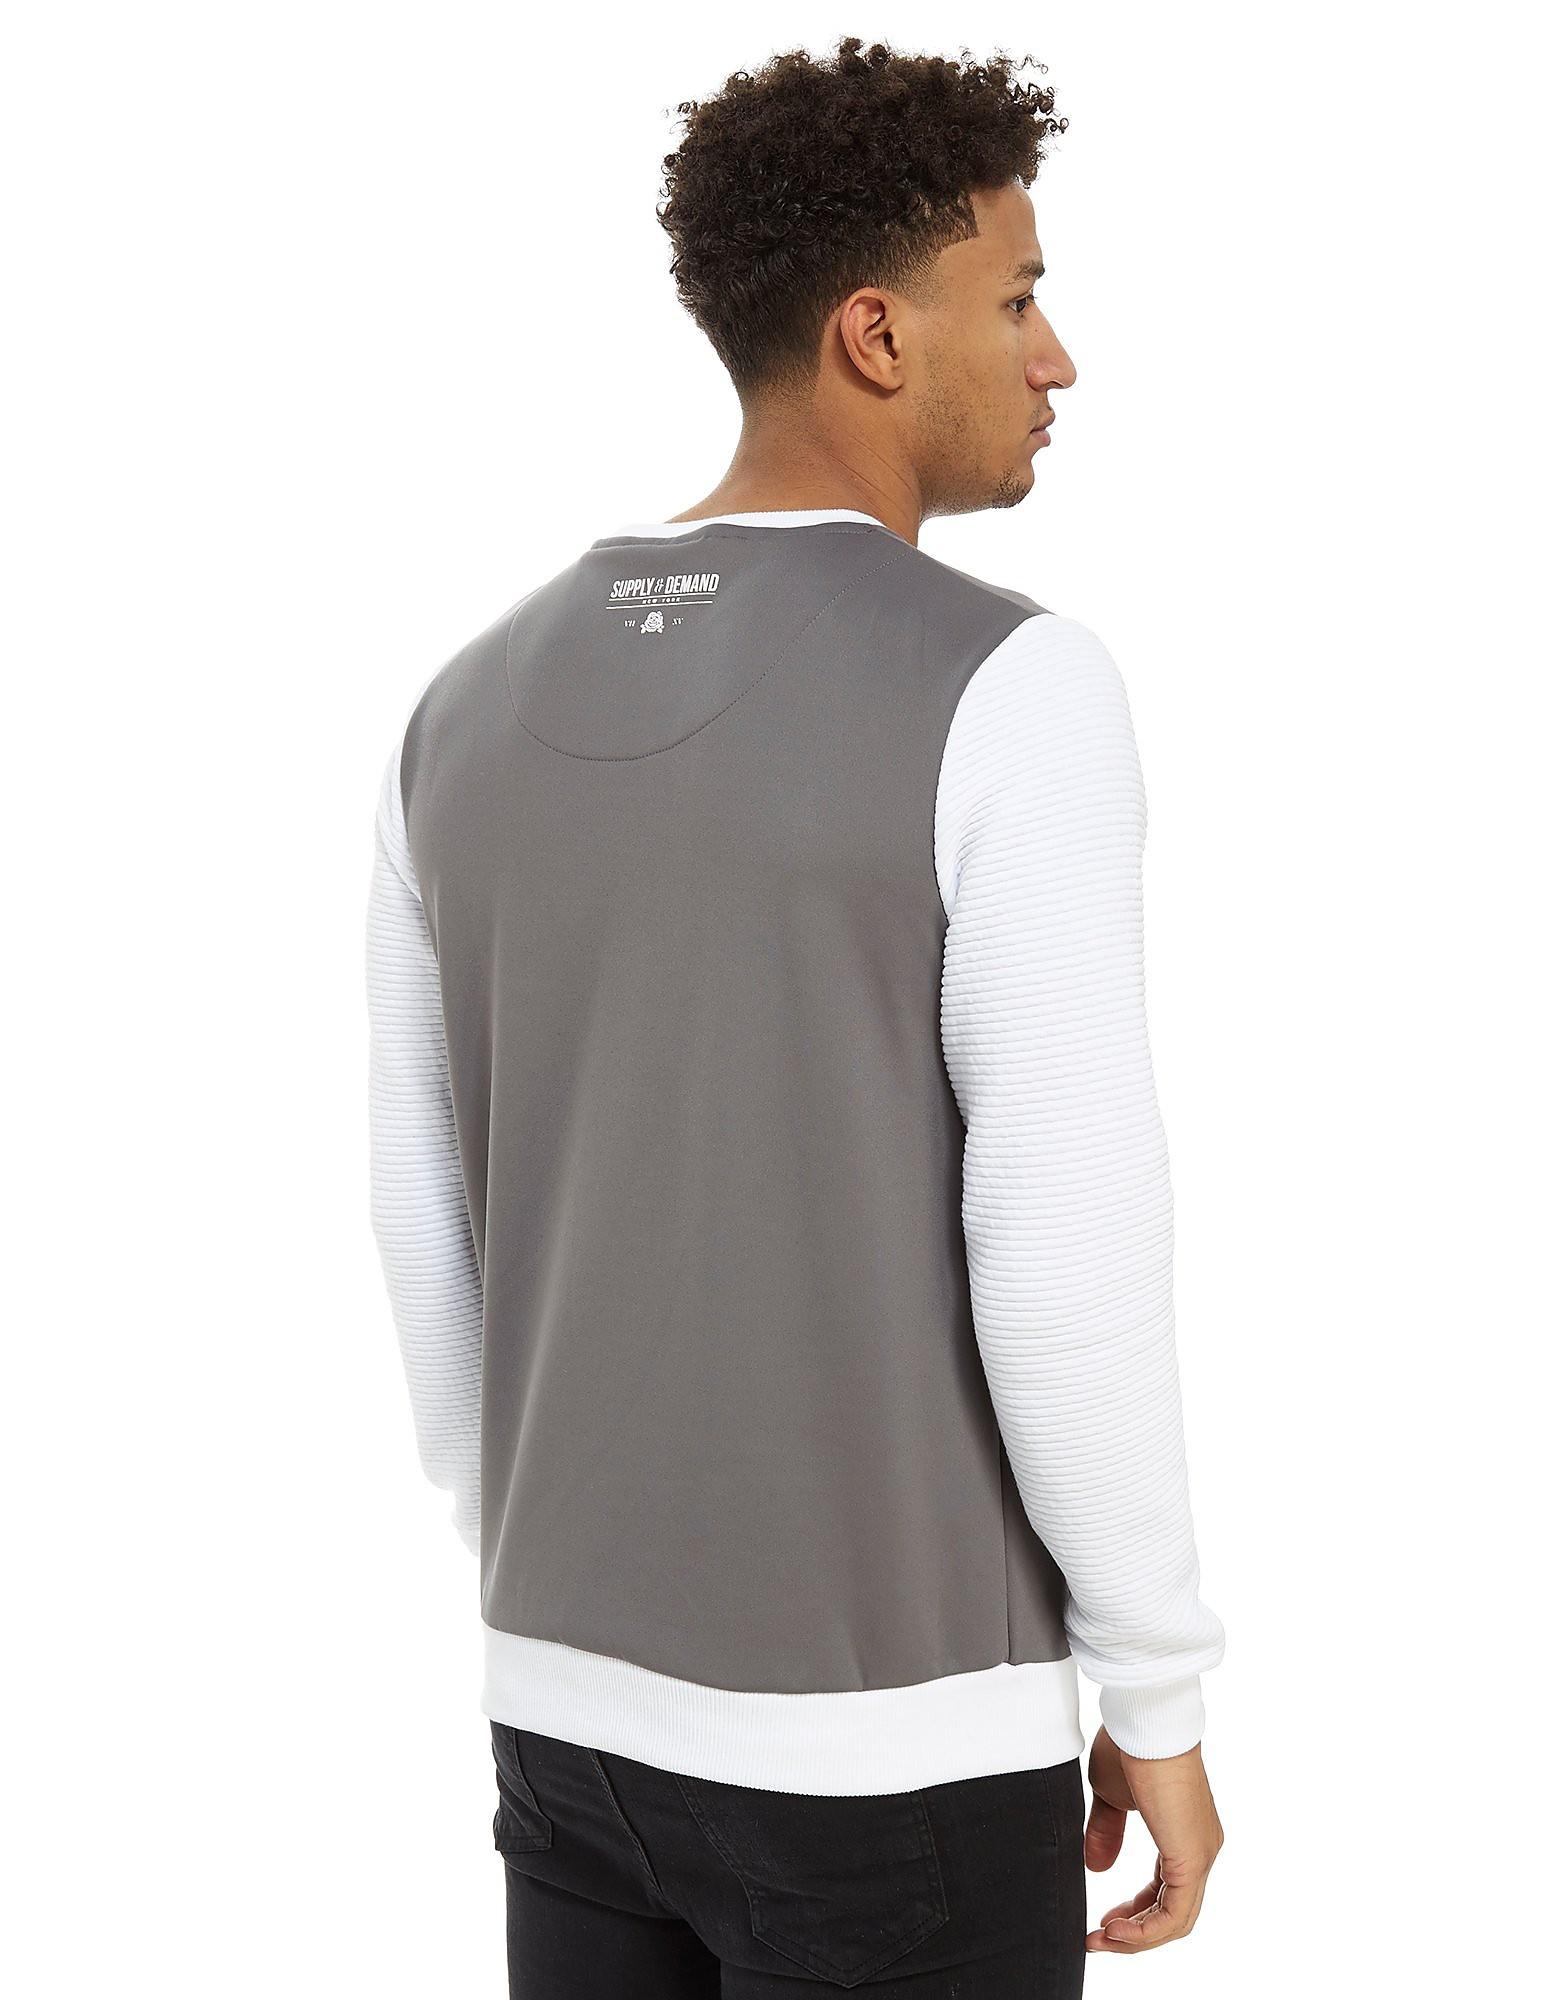 Supply & Demand Columbia Crew Sweatshirt